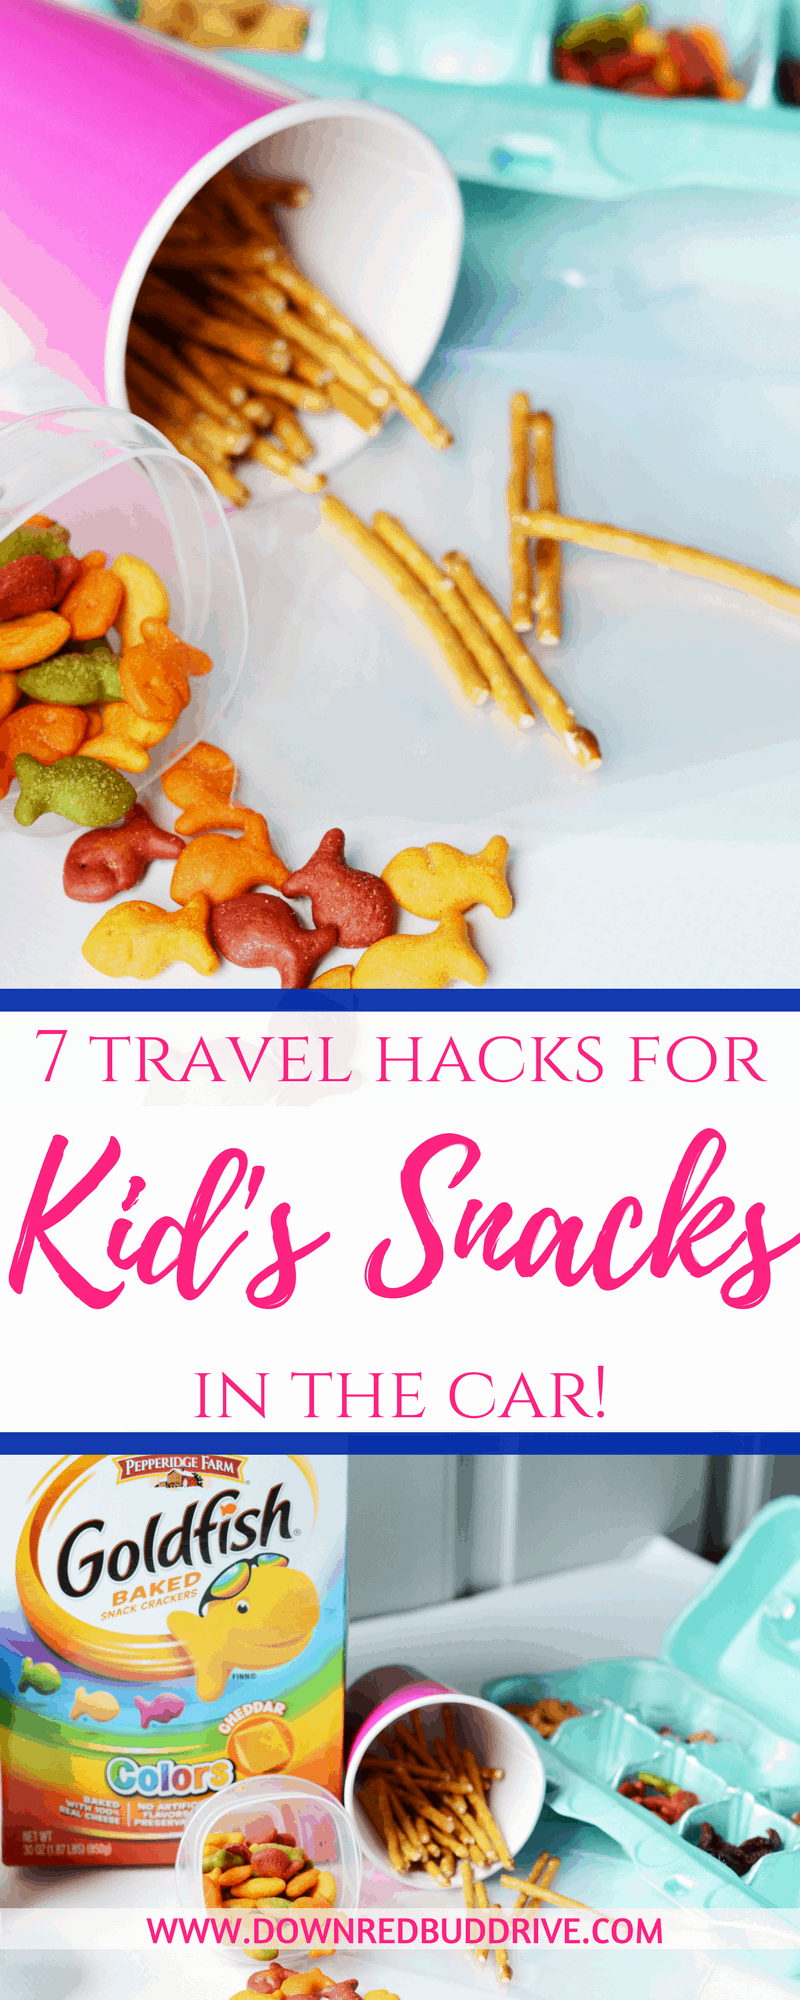 Kid's Snacks in the Car | Kid's Car Snacks | Roadtrip Hacks | Travel Hacks | Travel Snacks | Snacks in thr Car | Container Hacks | Down Redbud Drive #AD #GoldfishMoments #travelhacks @GoldfishSmiles